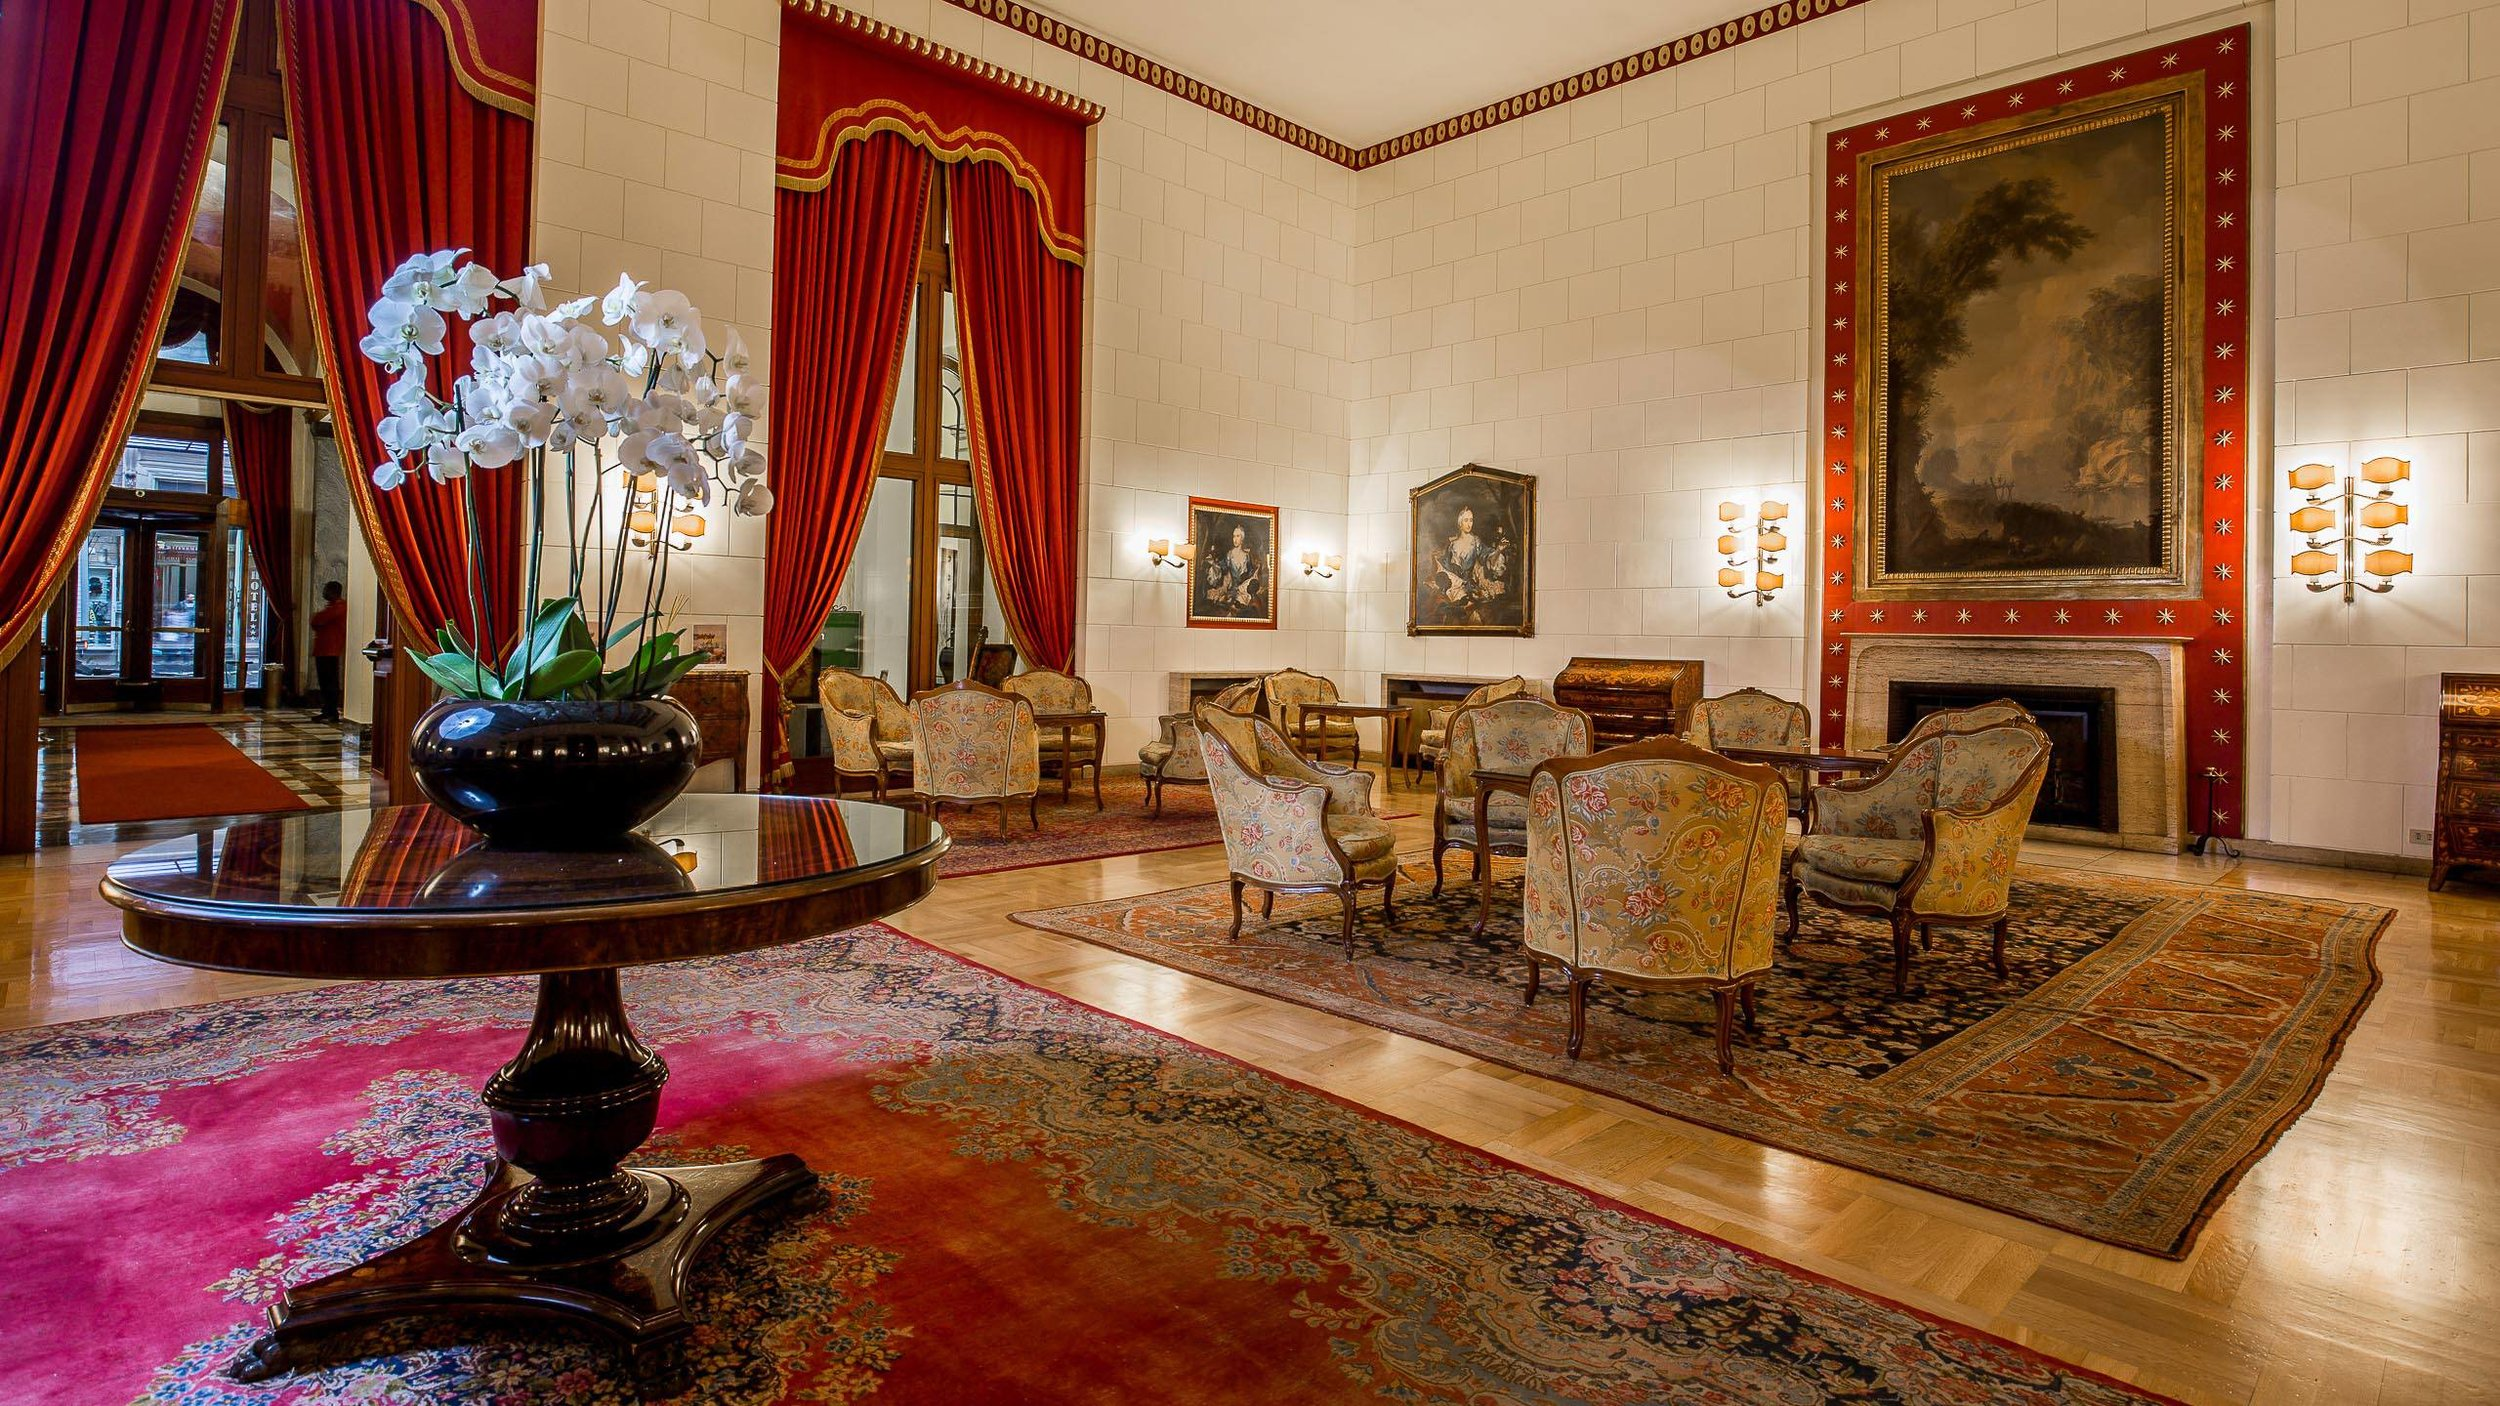 Hotel-Quirinale-Roma-hall-0118.jpg